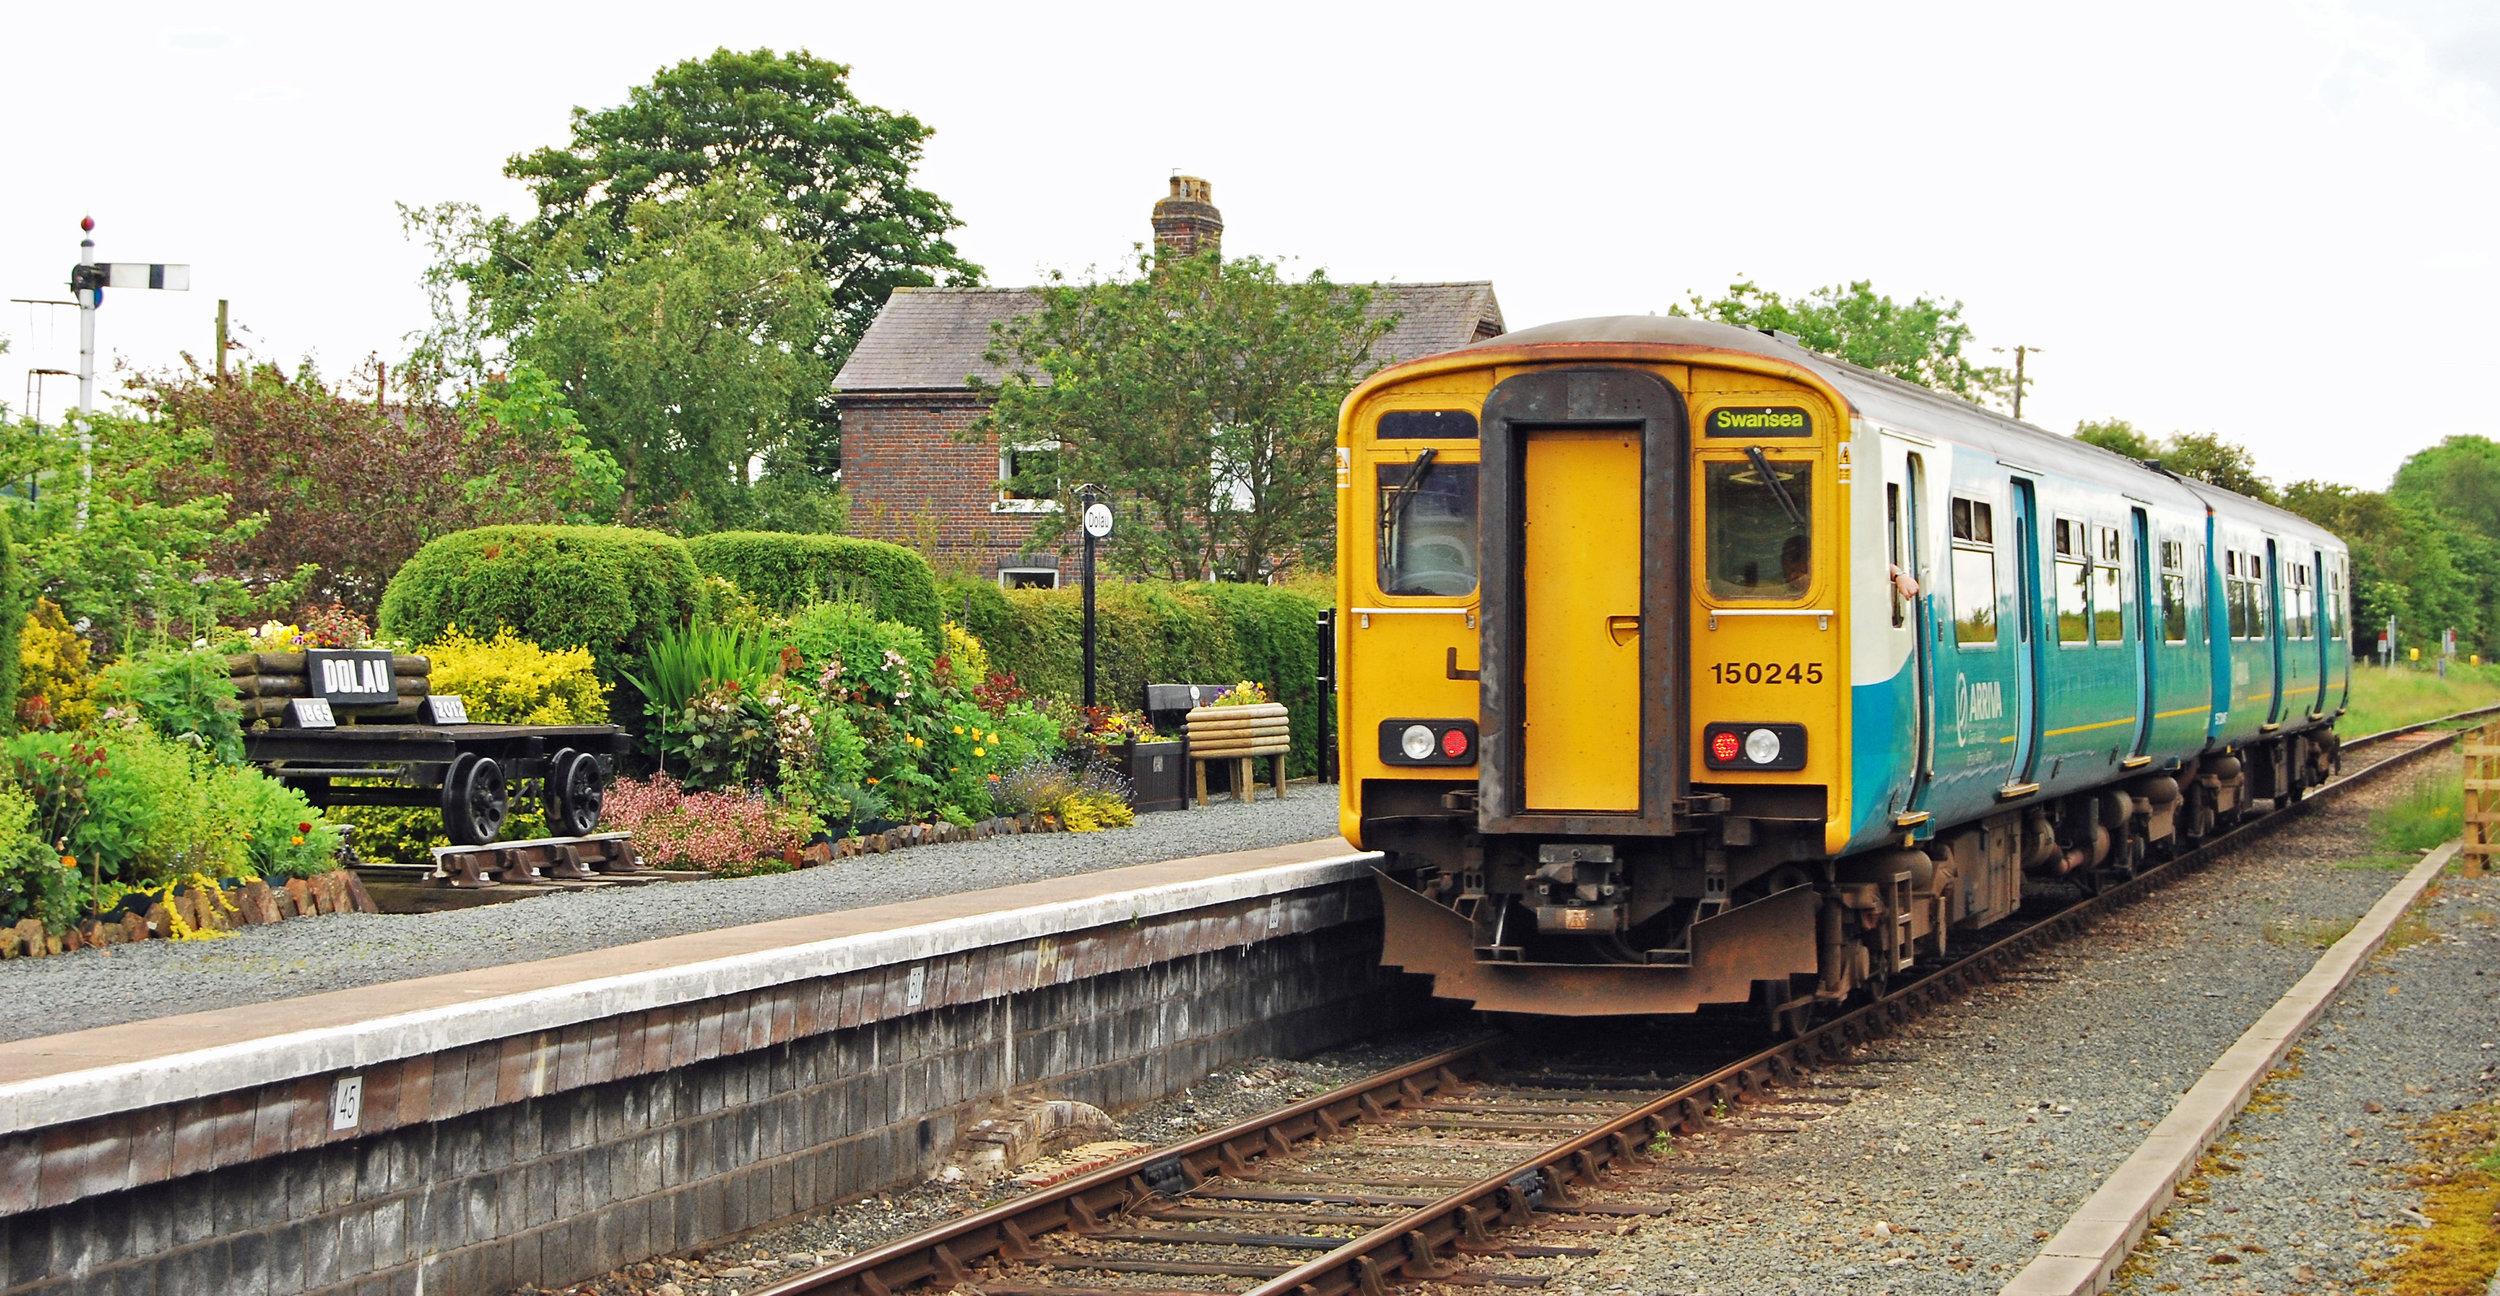 Arriva Wales train at Dolau station